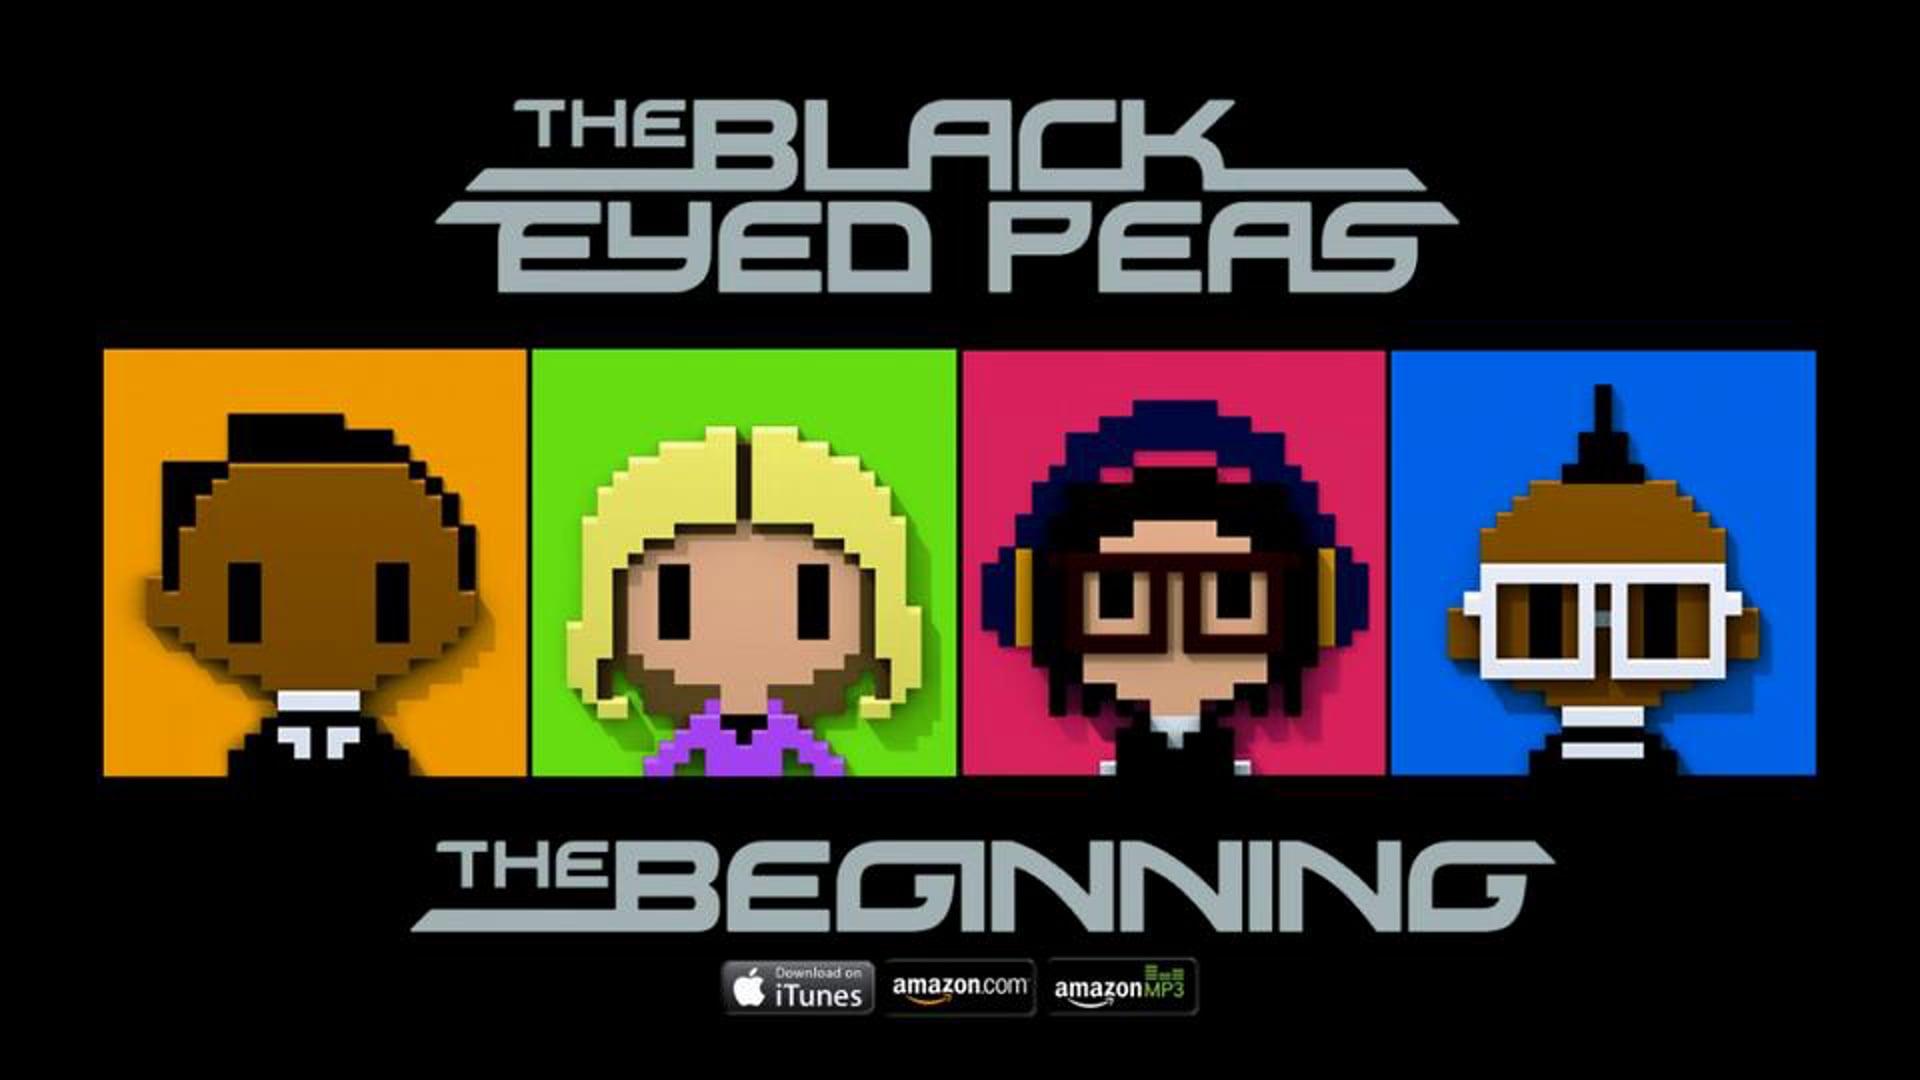 Black Eyed Peas / DIRTY BIT - 2010